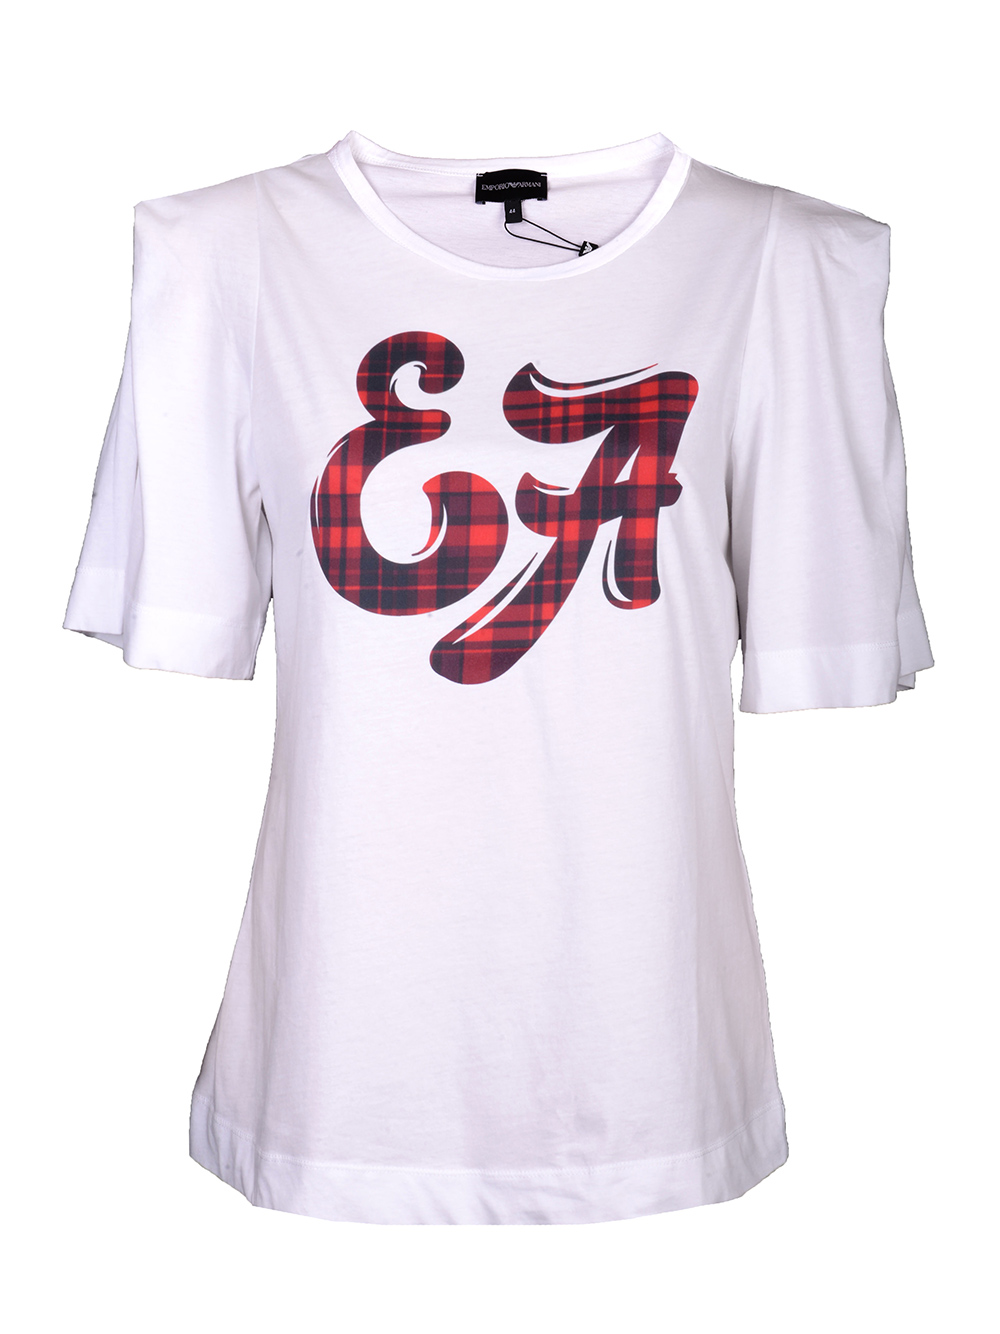 EMPORIO ARMANI Μπλούζα T-shirt 6G2T7Y 2J50Z ΛΕΥΚΟ